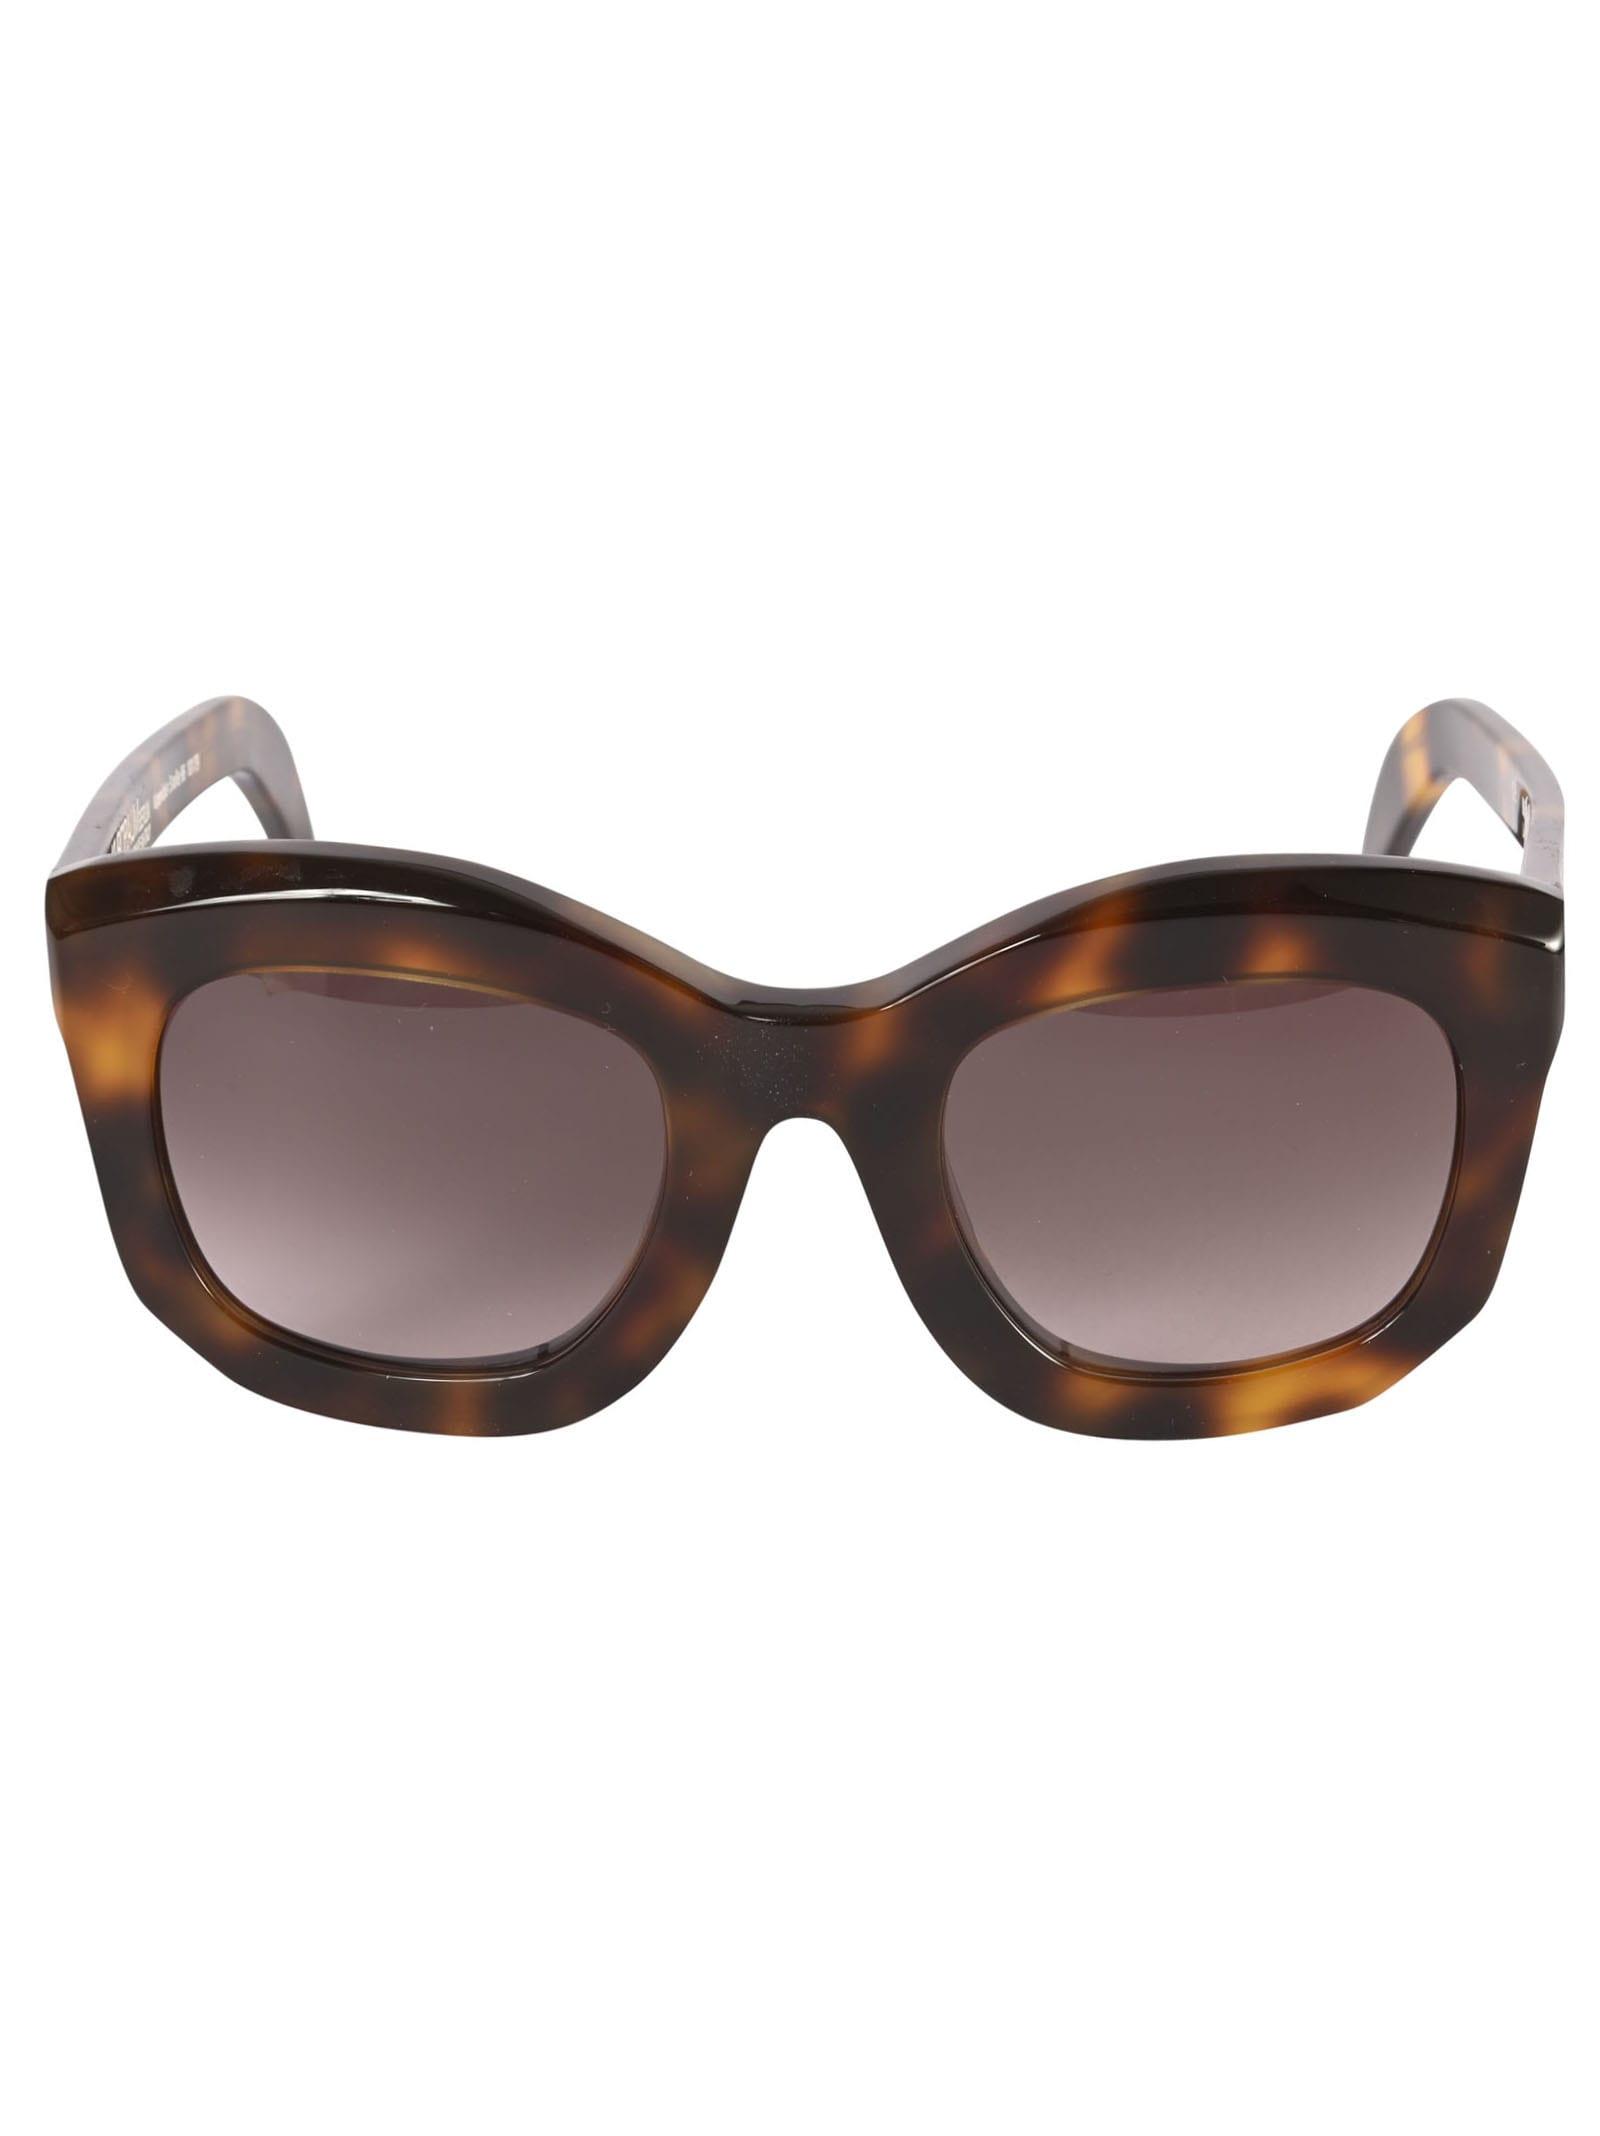 Classic Cat-Eye Frame Sunglasses